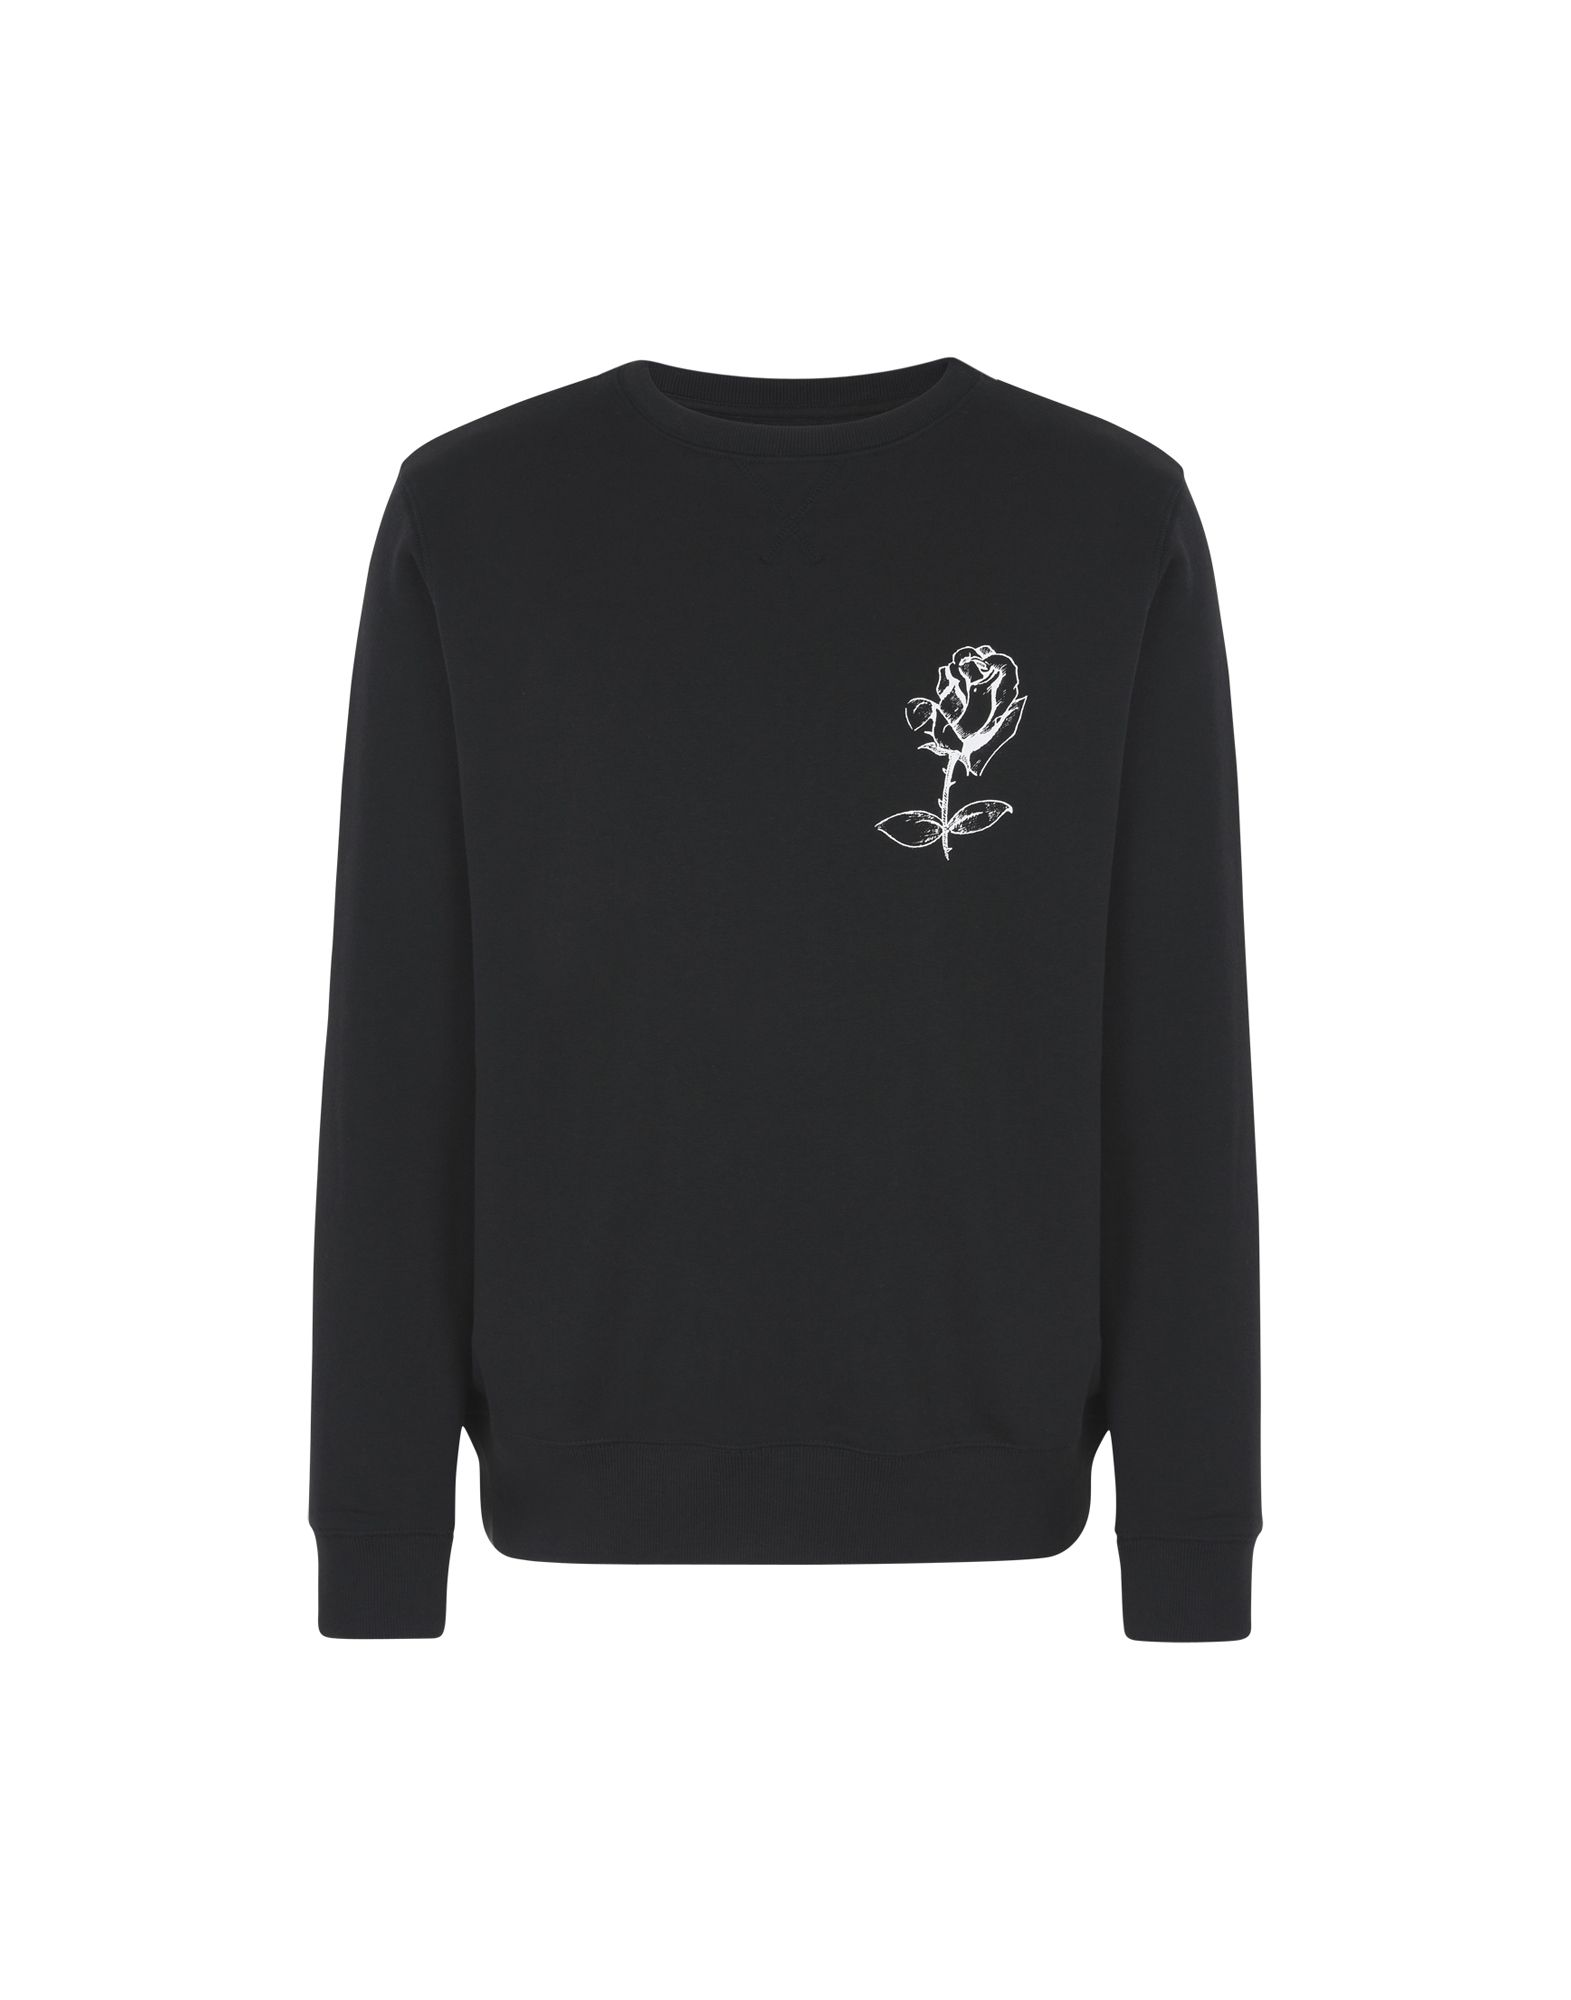 SOULLAND Sweatshirt in Black